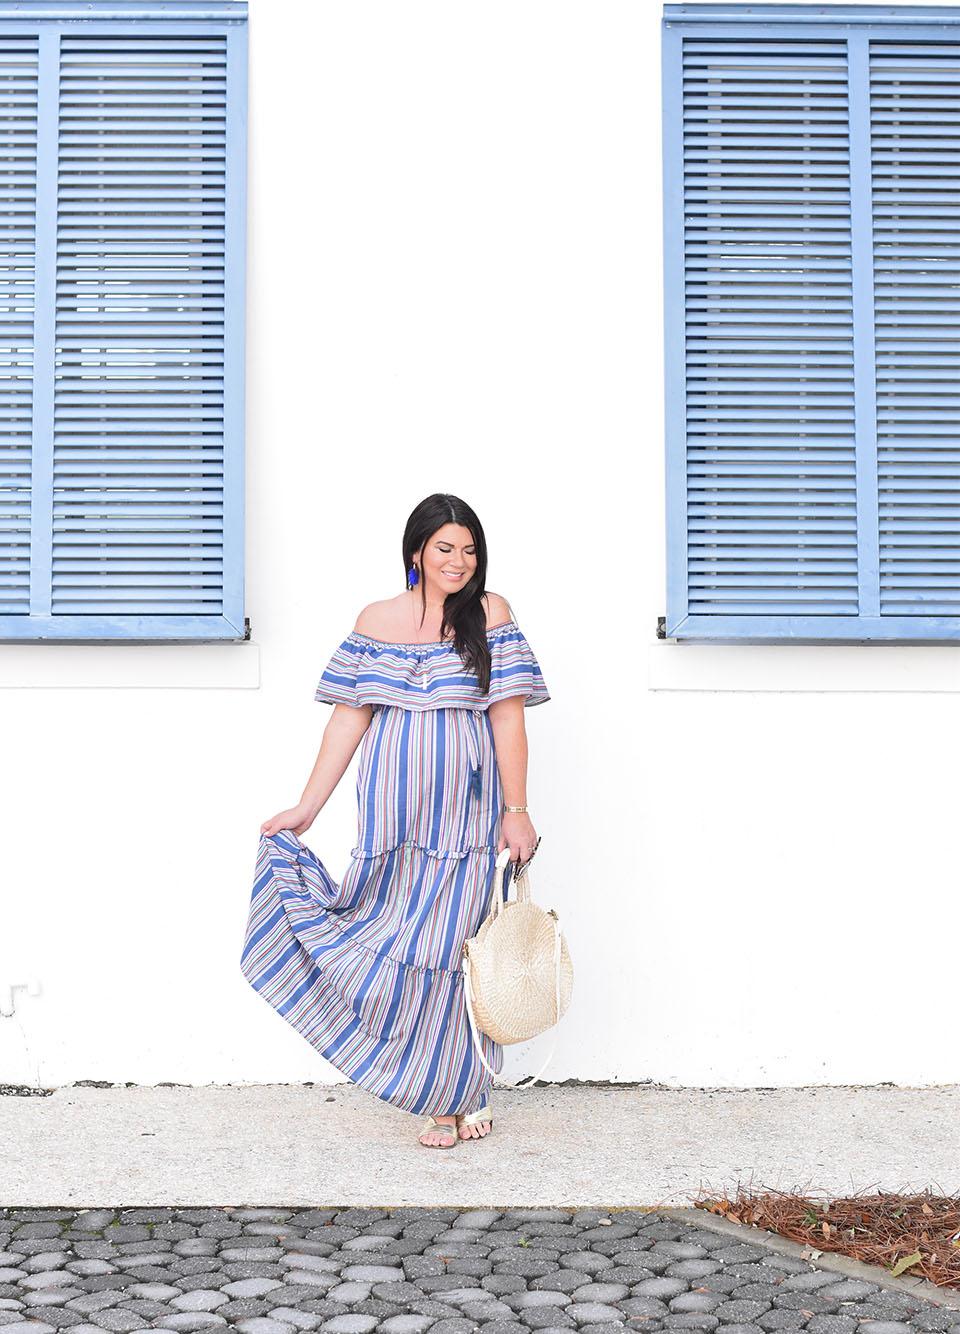 Blue Stripe Maxi Dress on 30A in Alys Beach